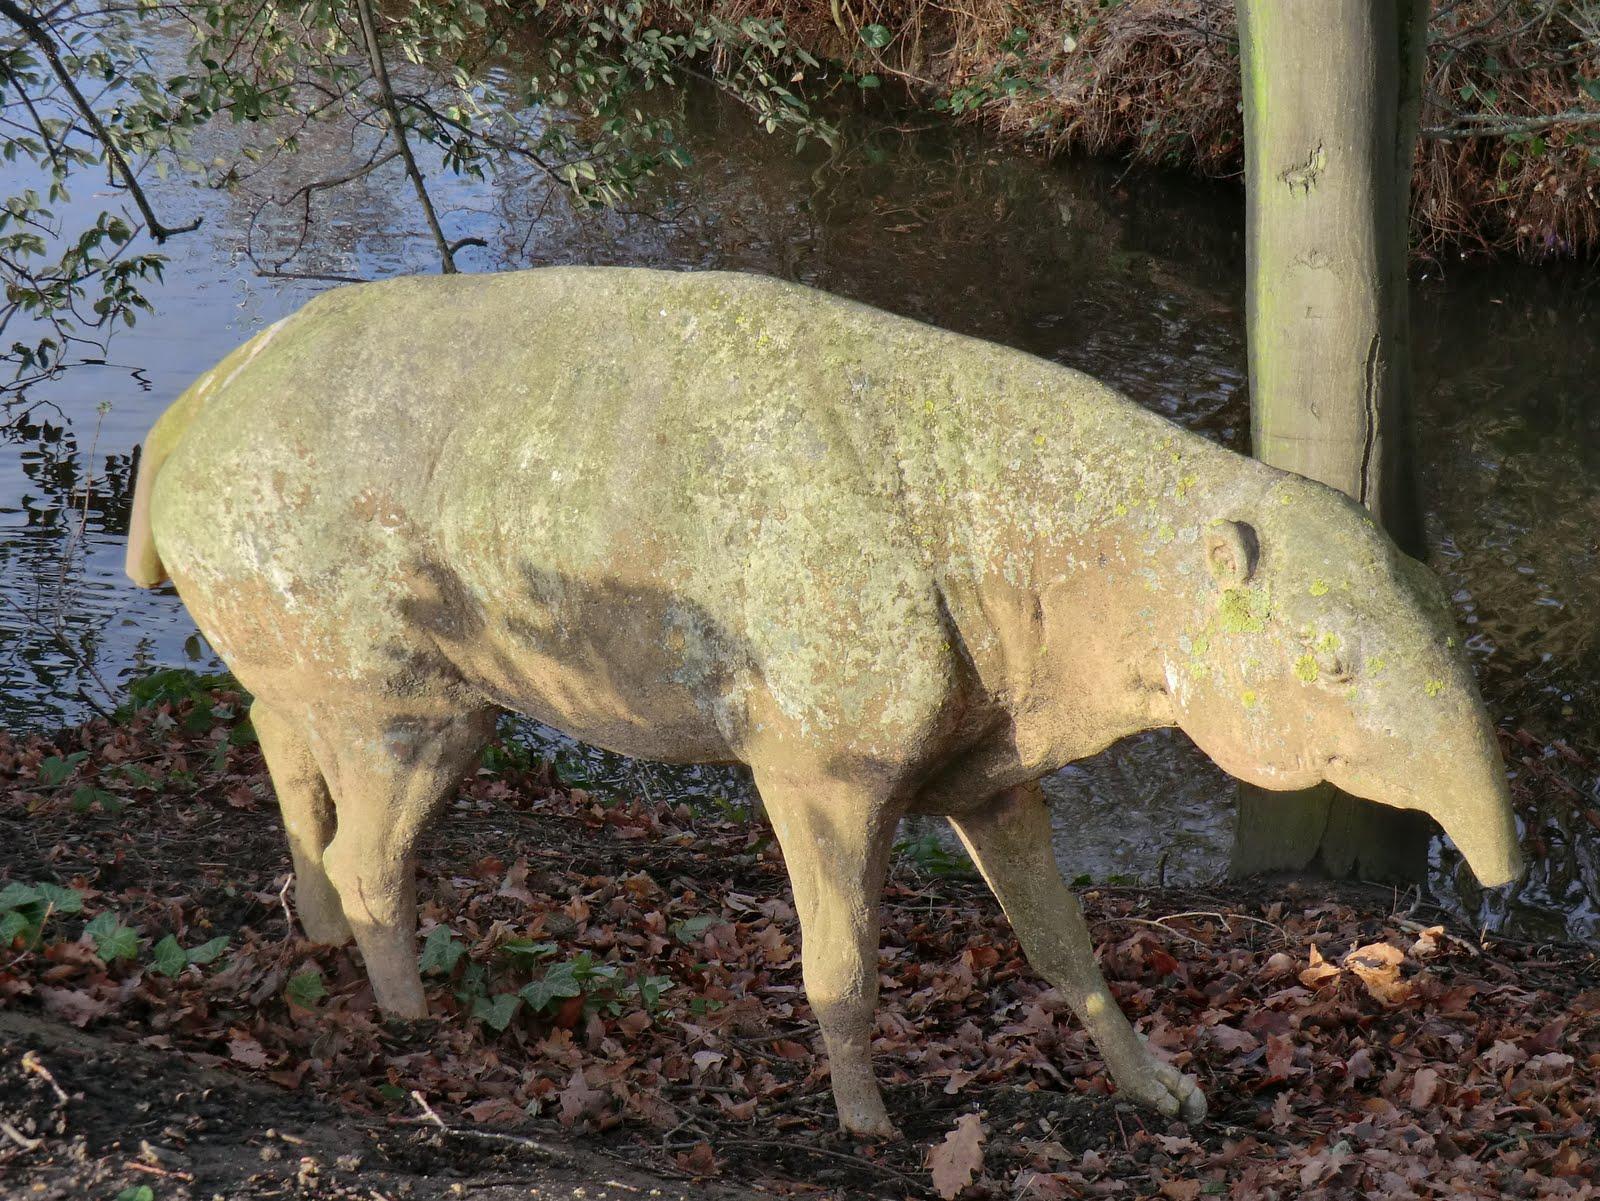 CIMG9761 Palaeotherium, Crystal Palace Park